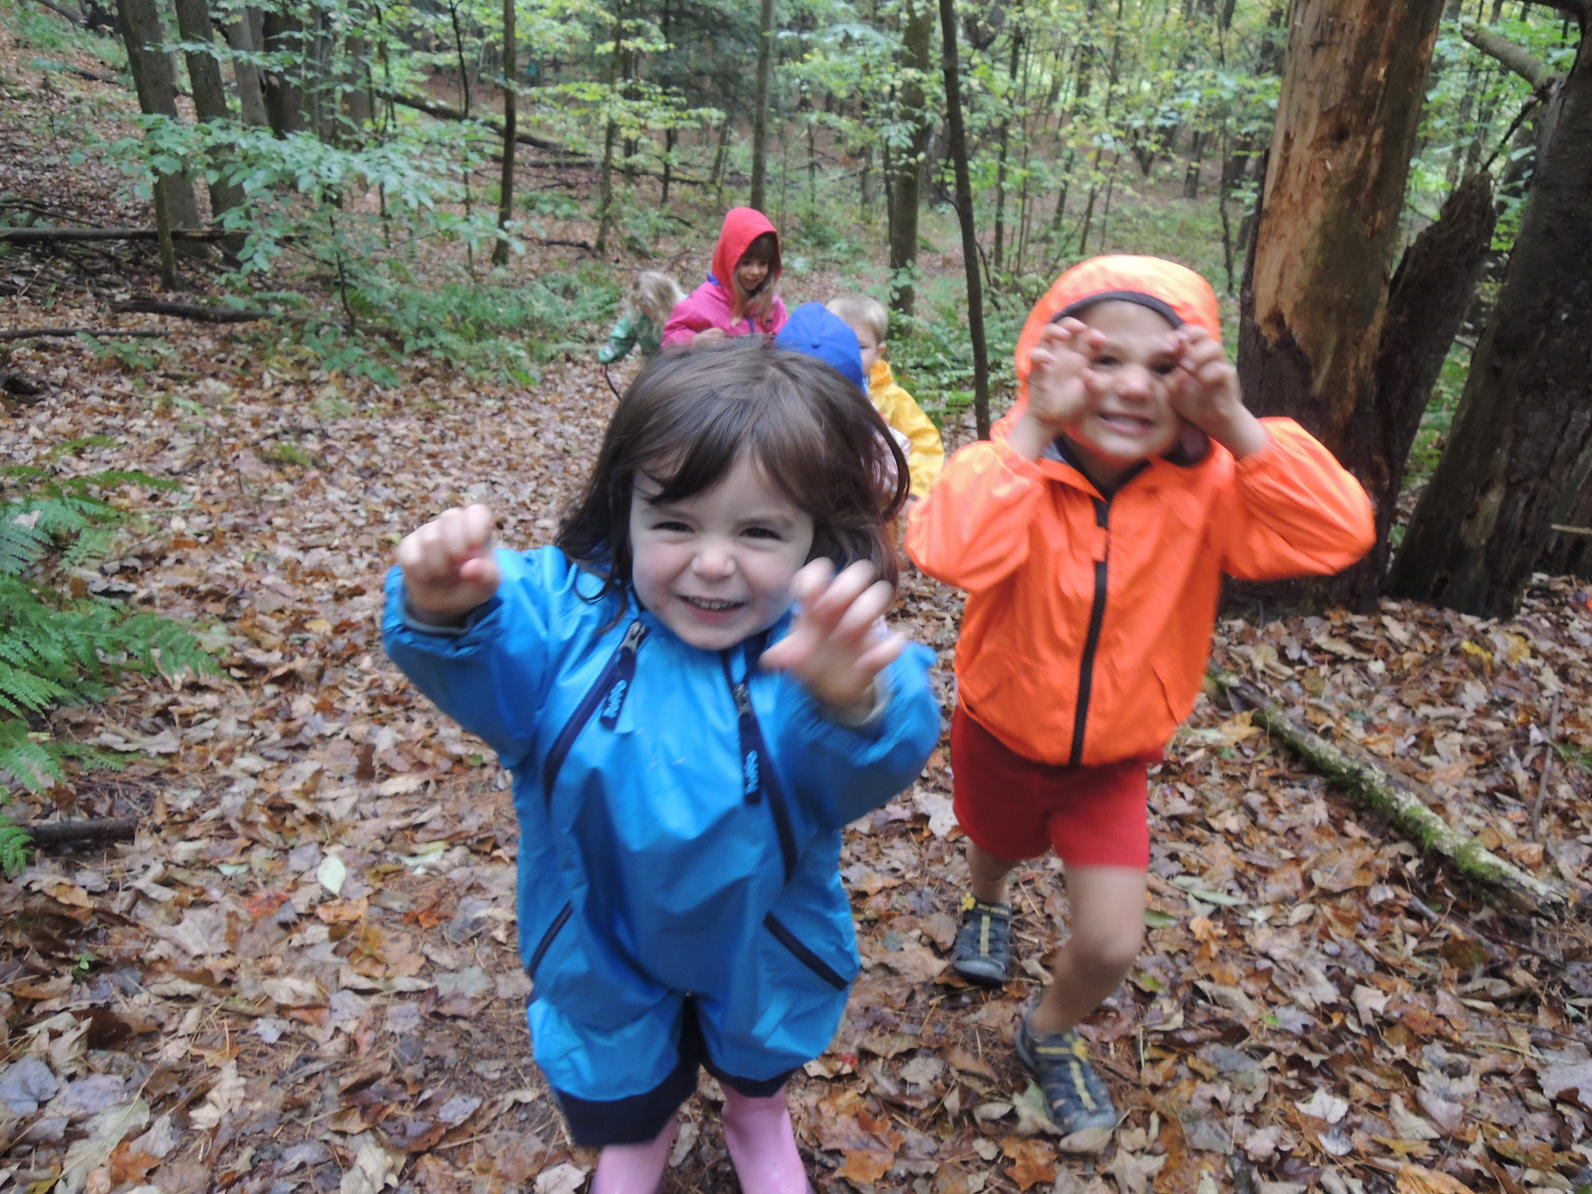 Preschoolers Roar